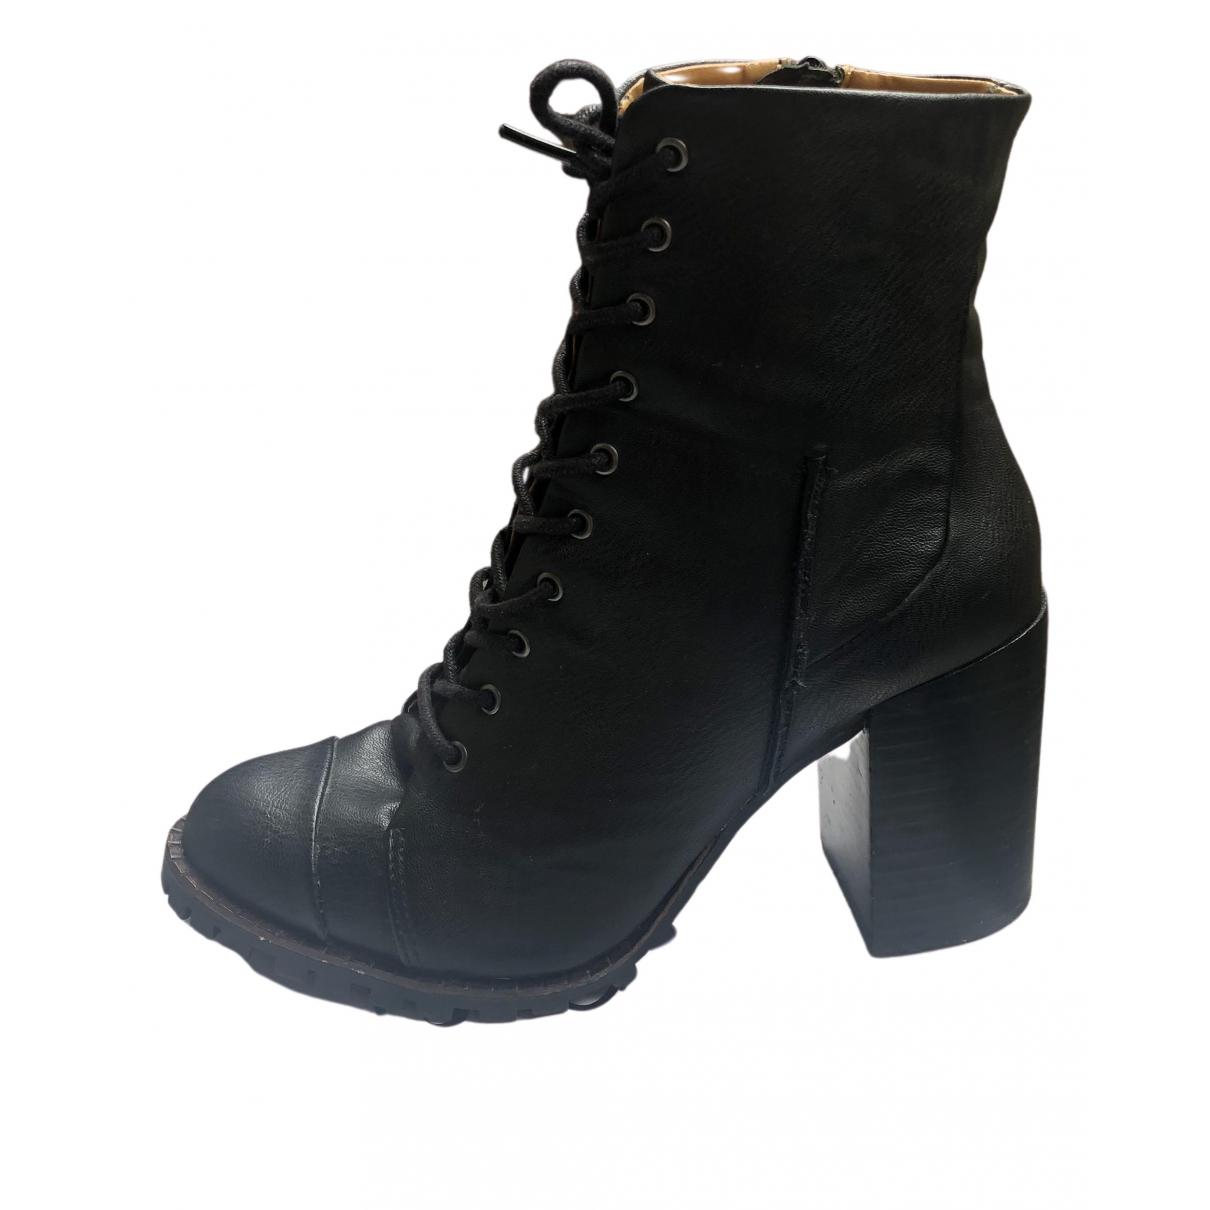 Steve Madden - Boots   pour femme - noir